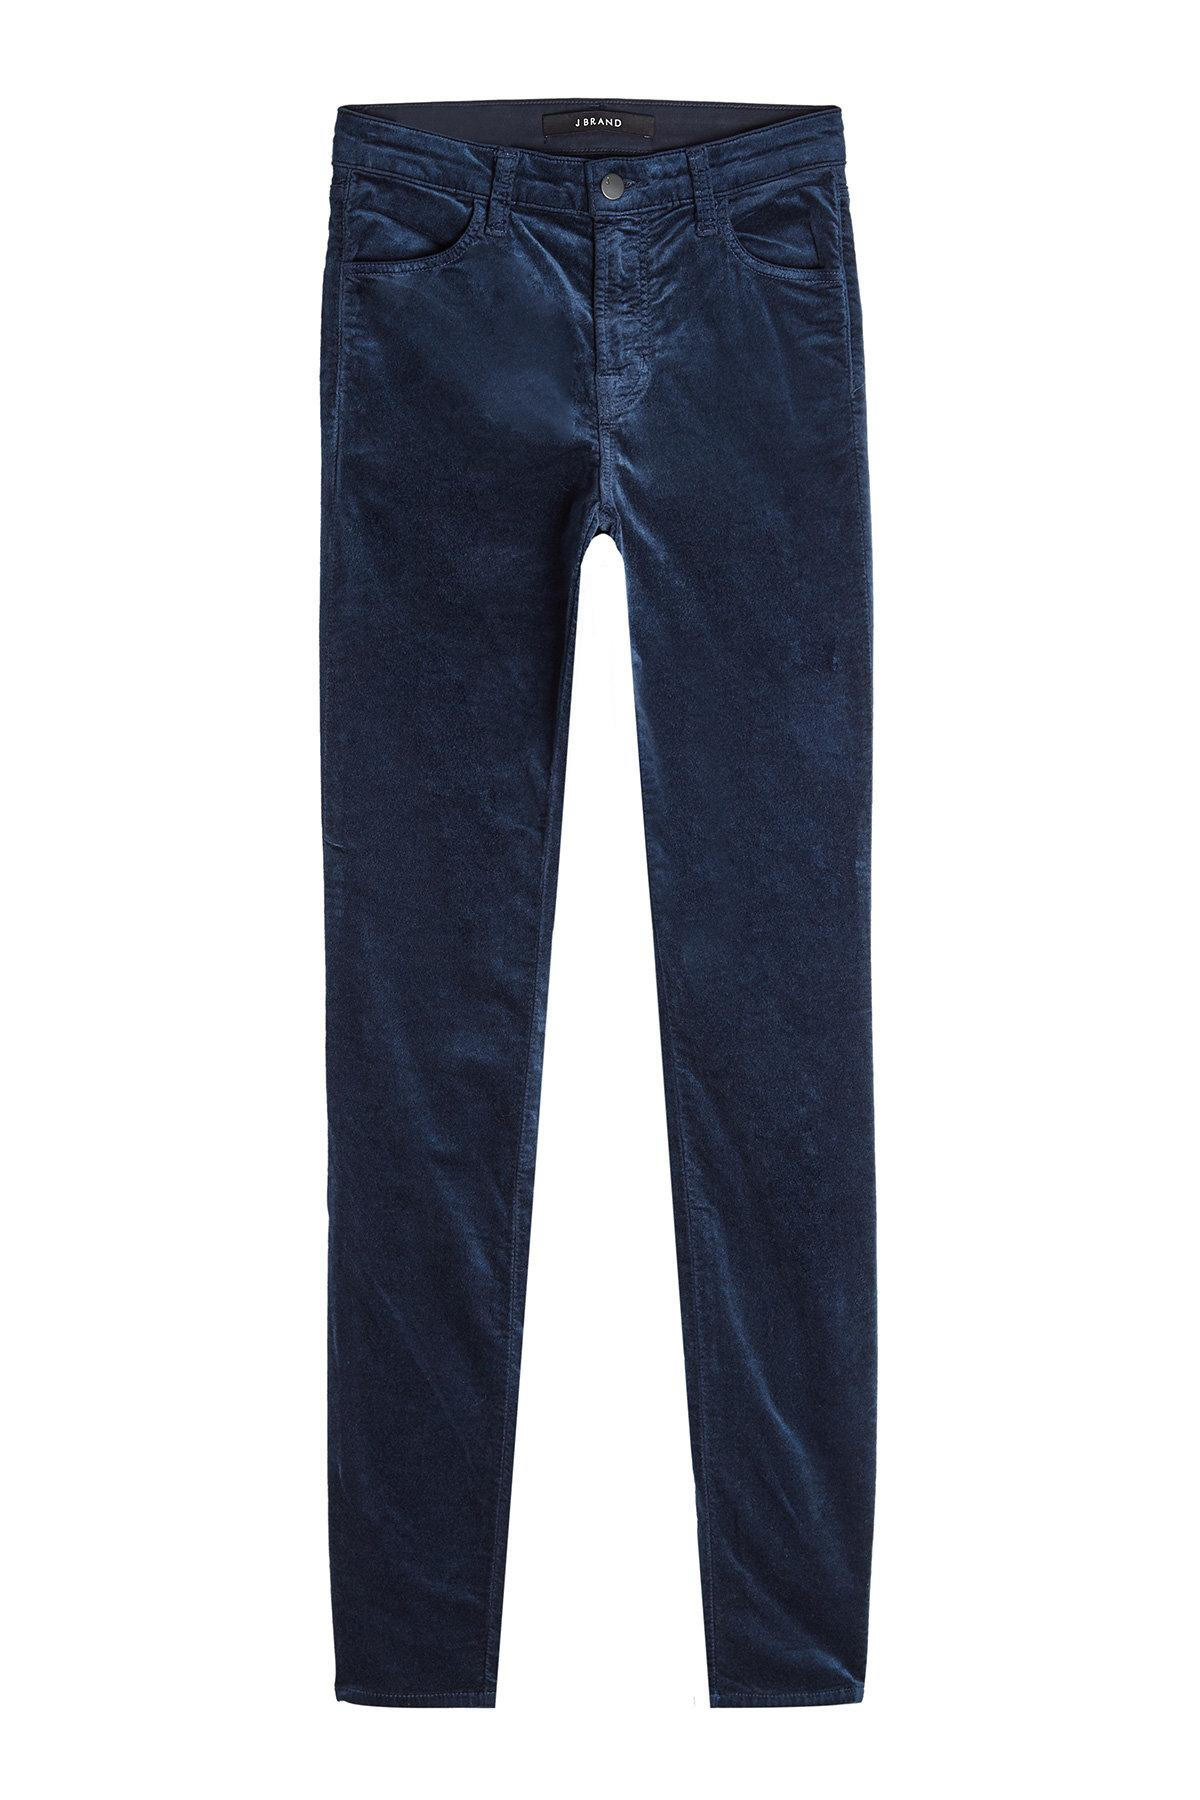 J Brand Velvet Corduroy Pants With Cotton In Blue